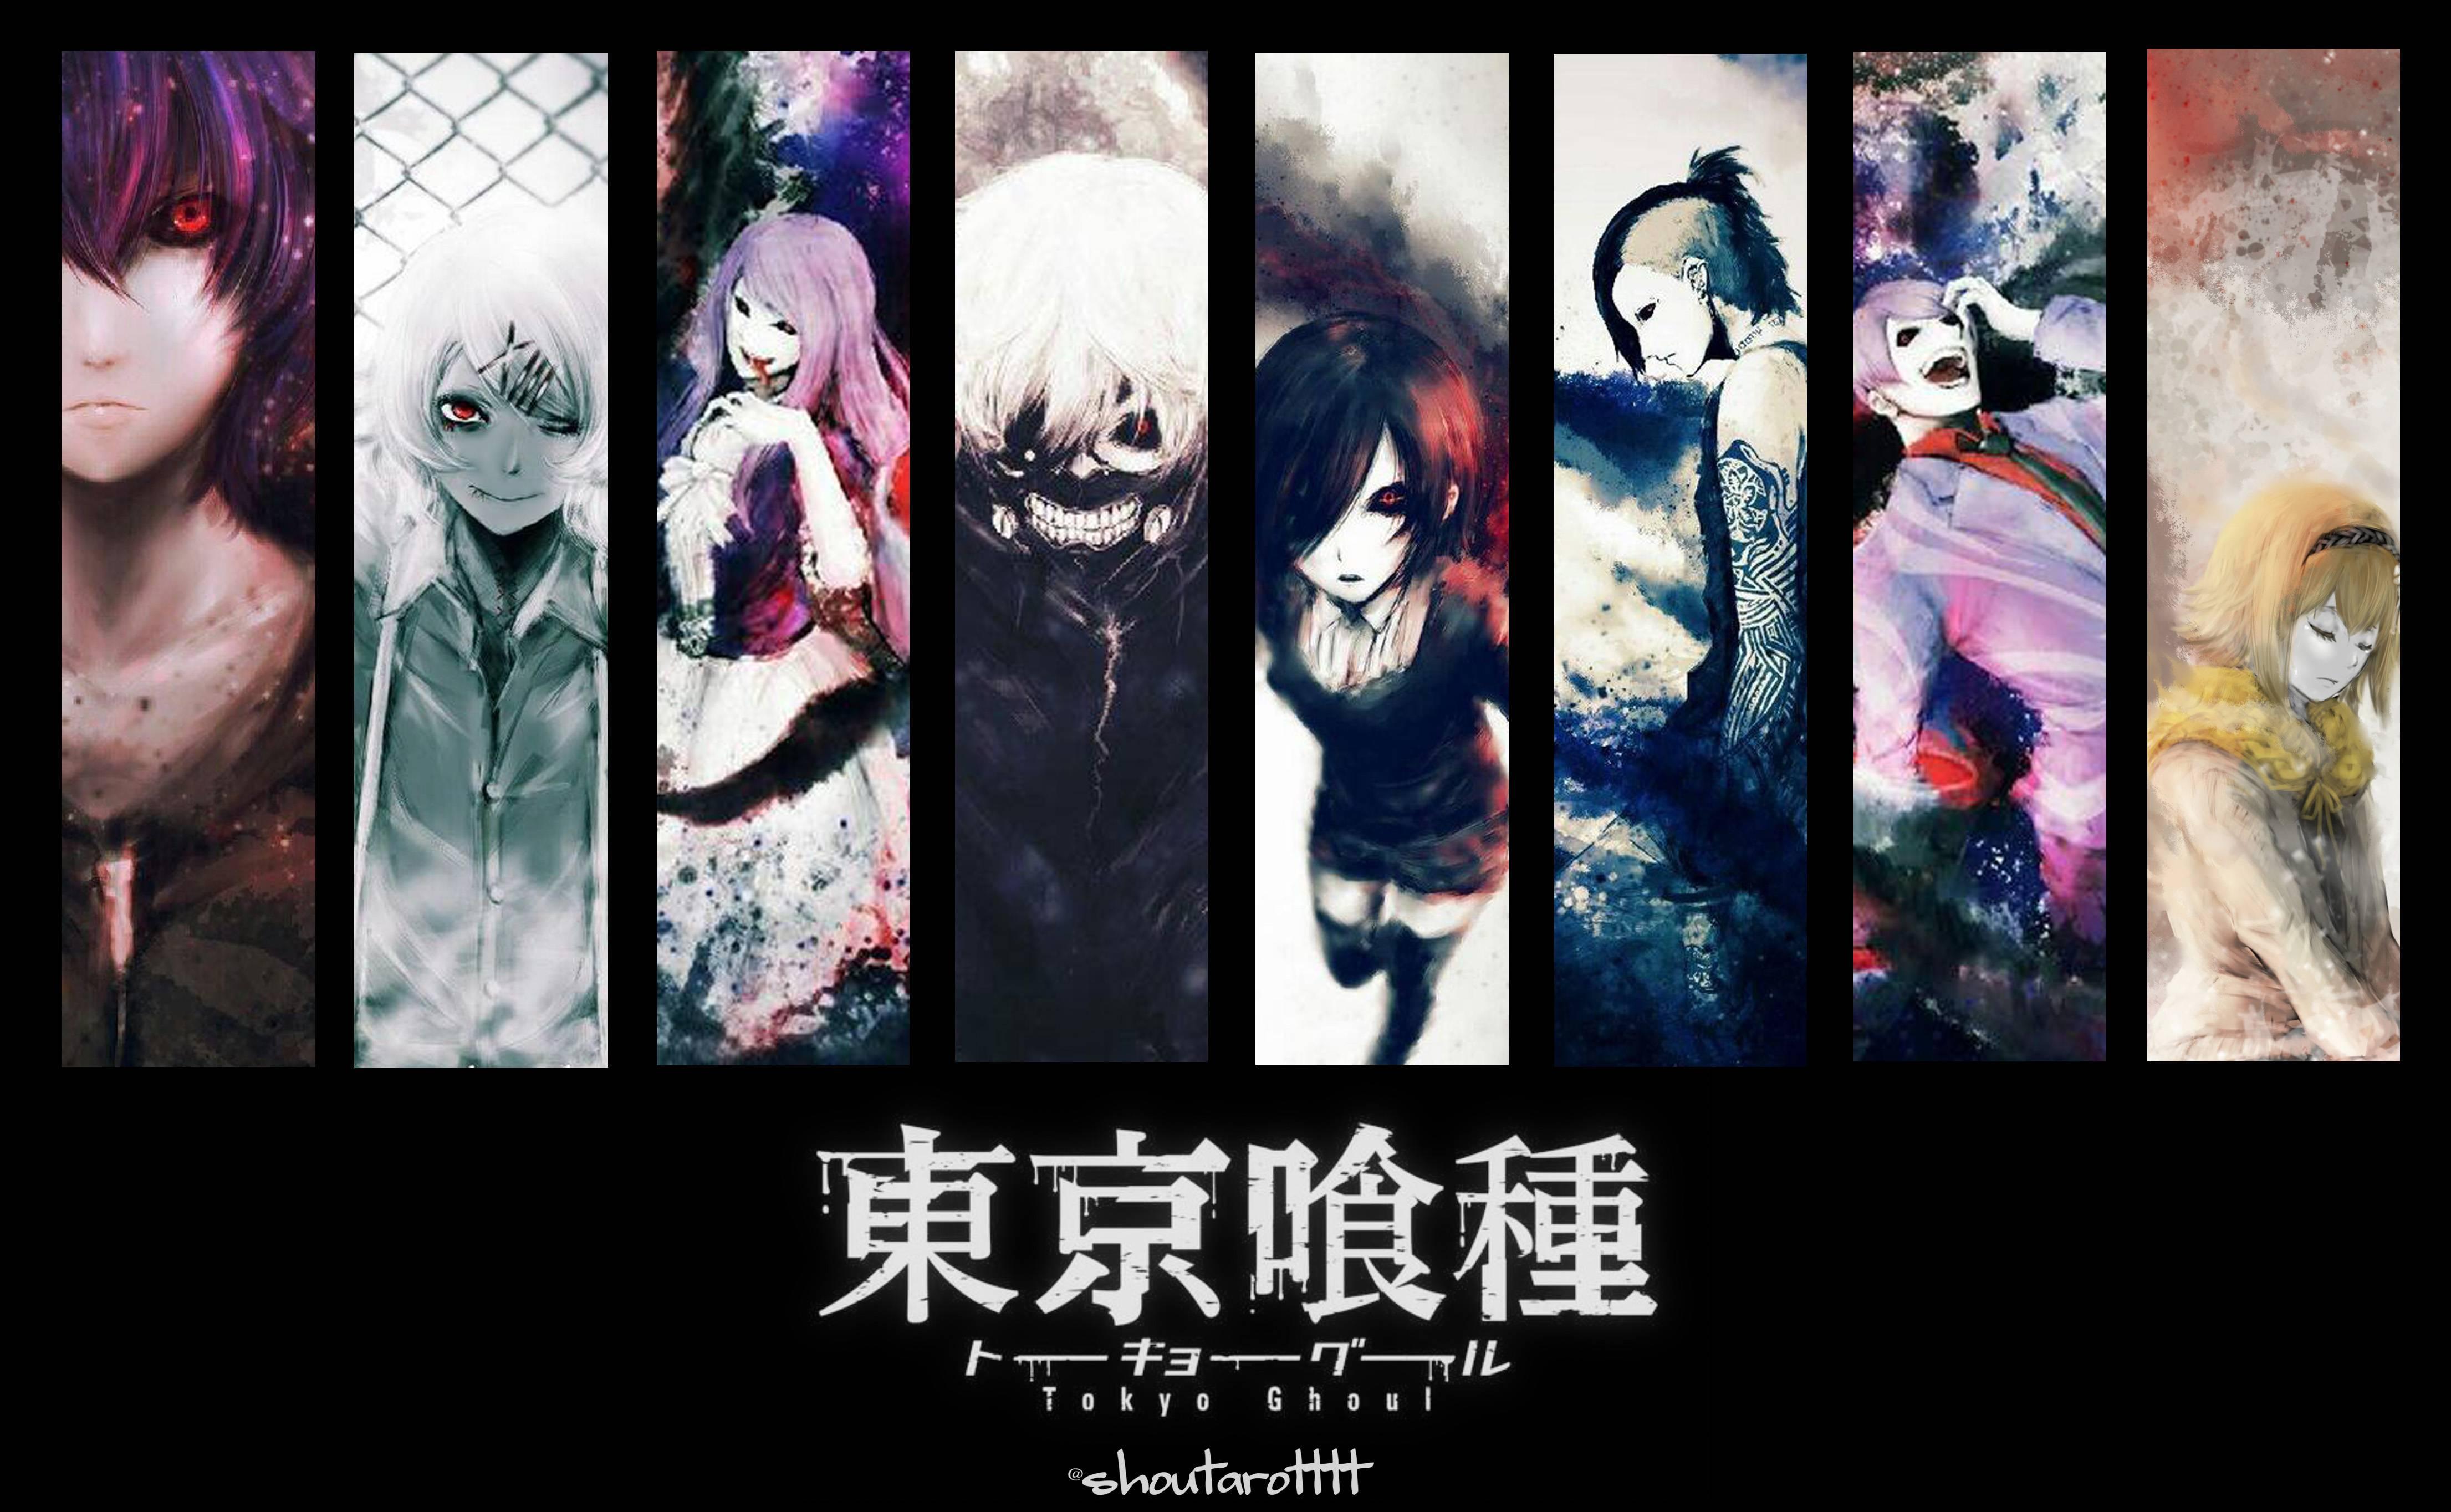 Tokyo Ghoul Saison 2 - Dernier Débat, Dernier Episode ZL45H-qn2RmvSSsjMdCD8hauAds